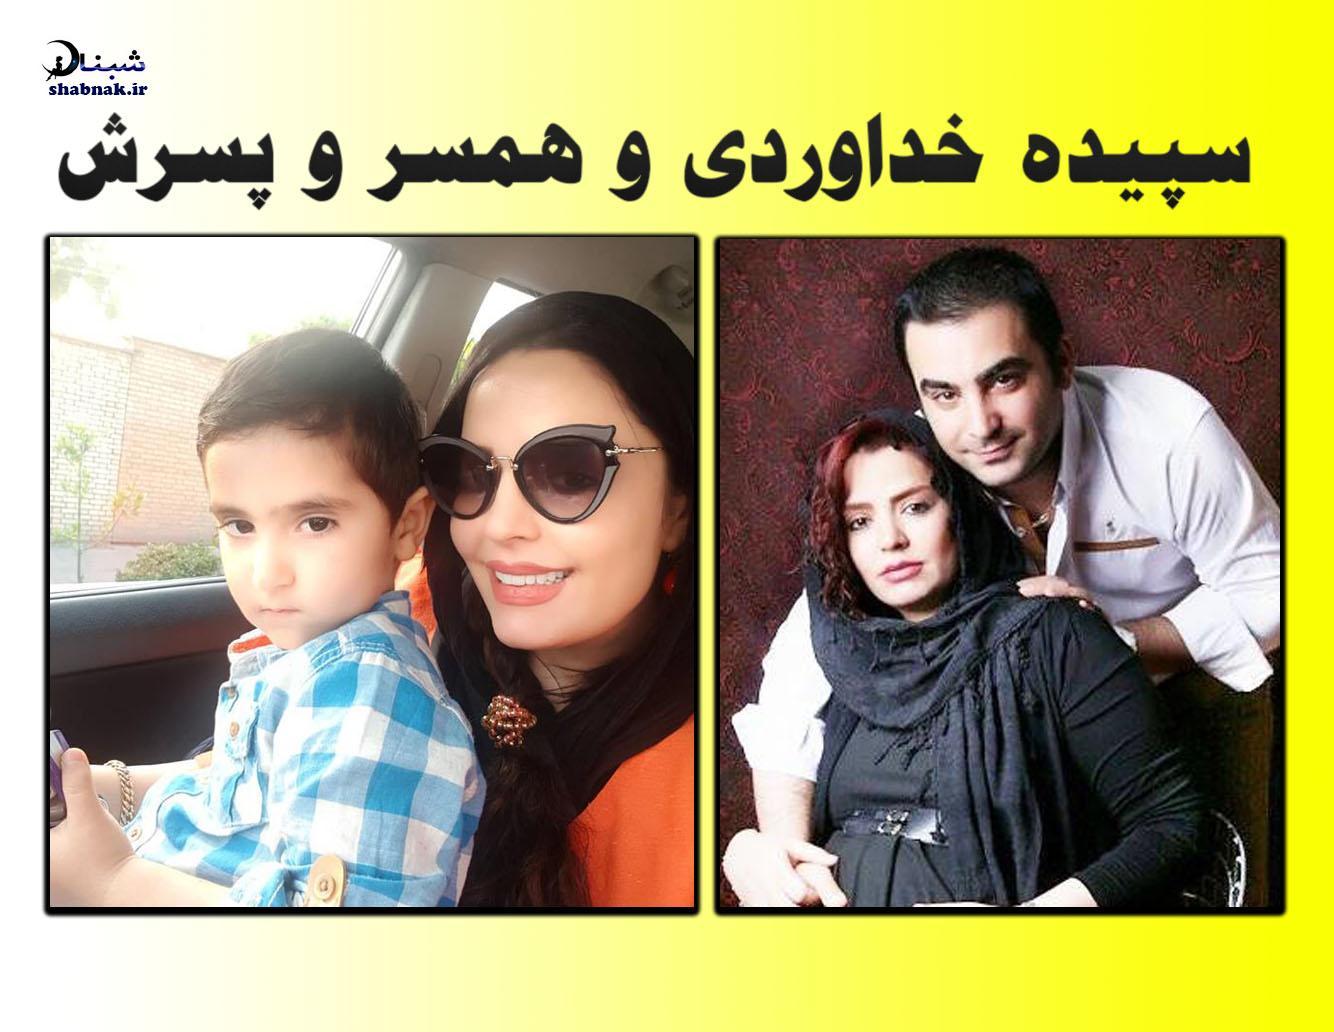 sepideh khodaverdi 8 - بیوگرافی سپیده خداوردی و همسرش +ماجرای طلاق و تصاویر